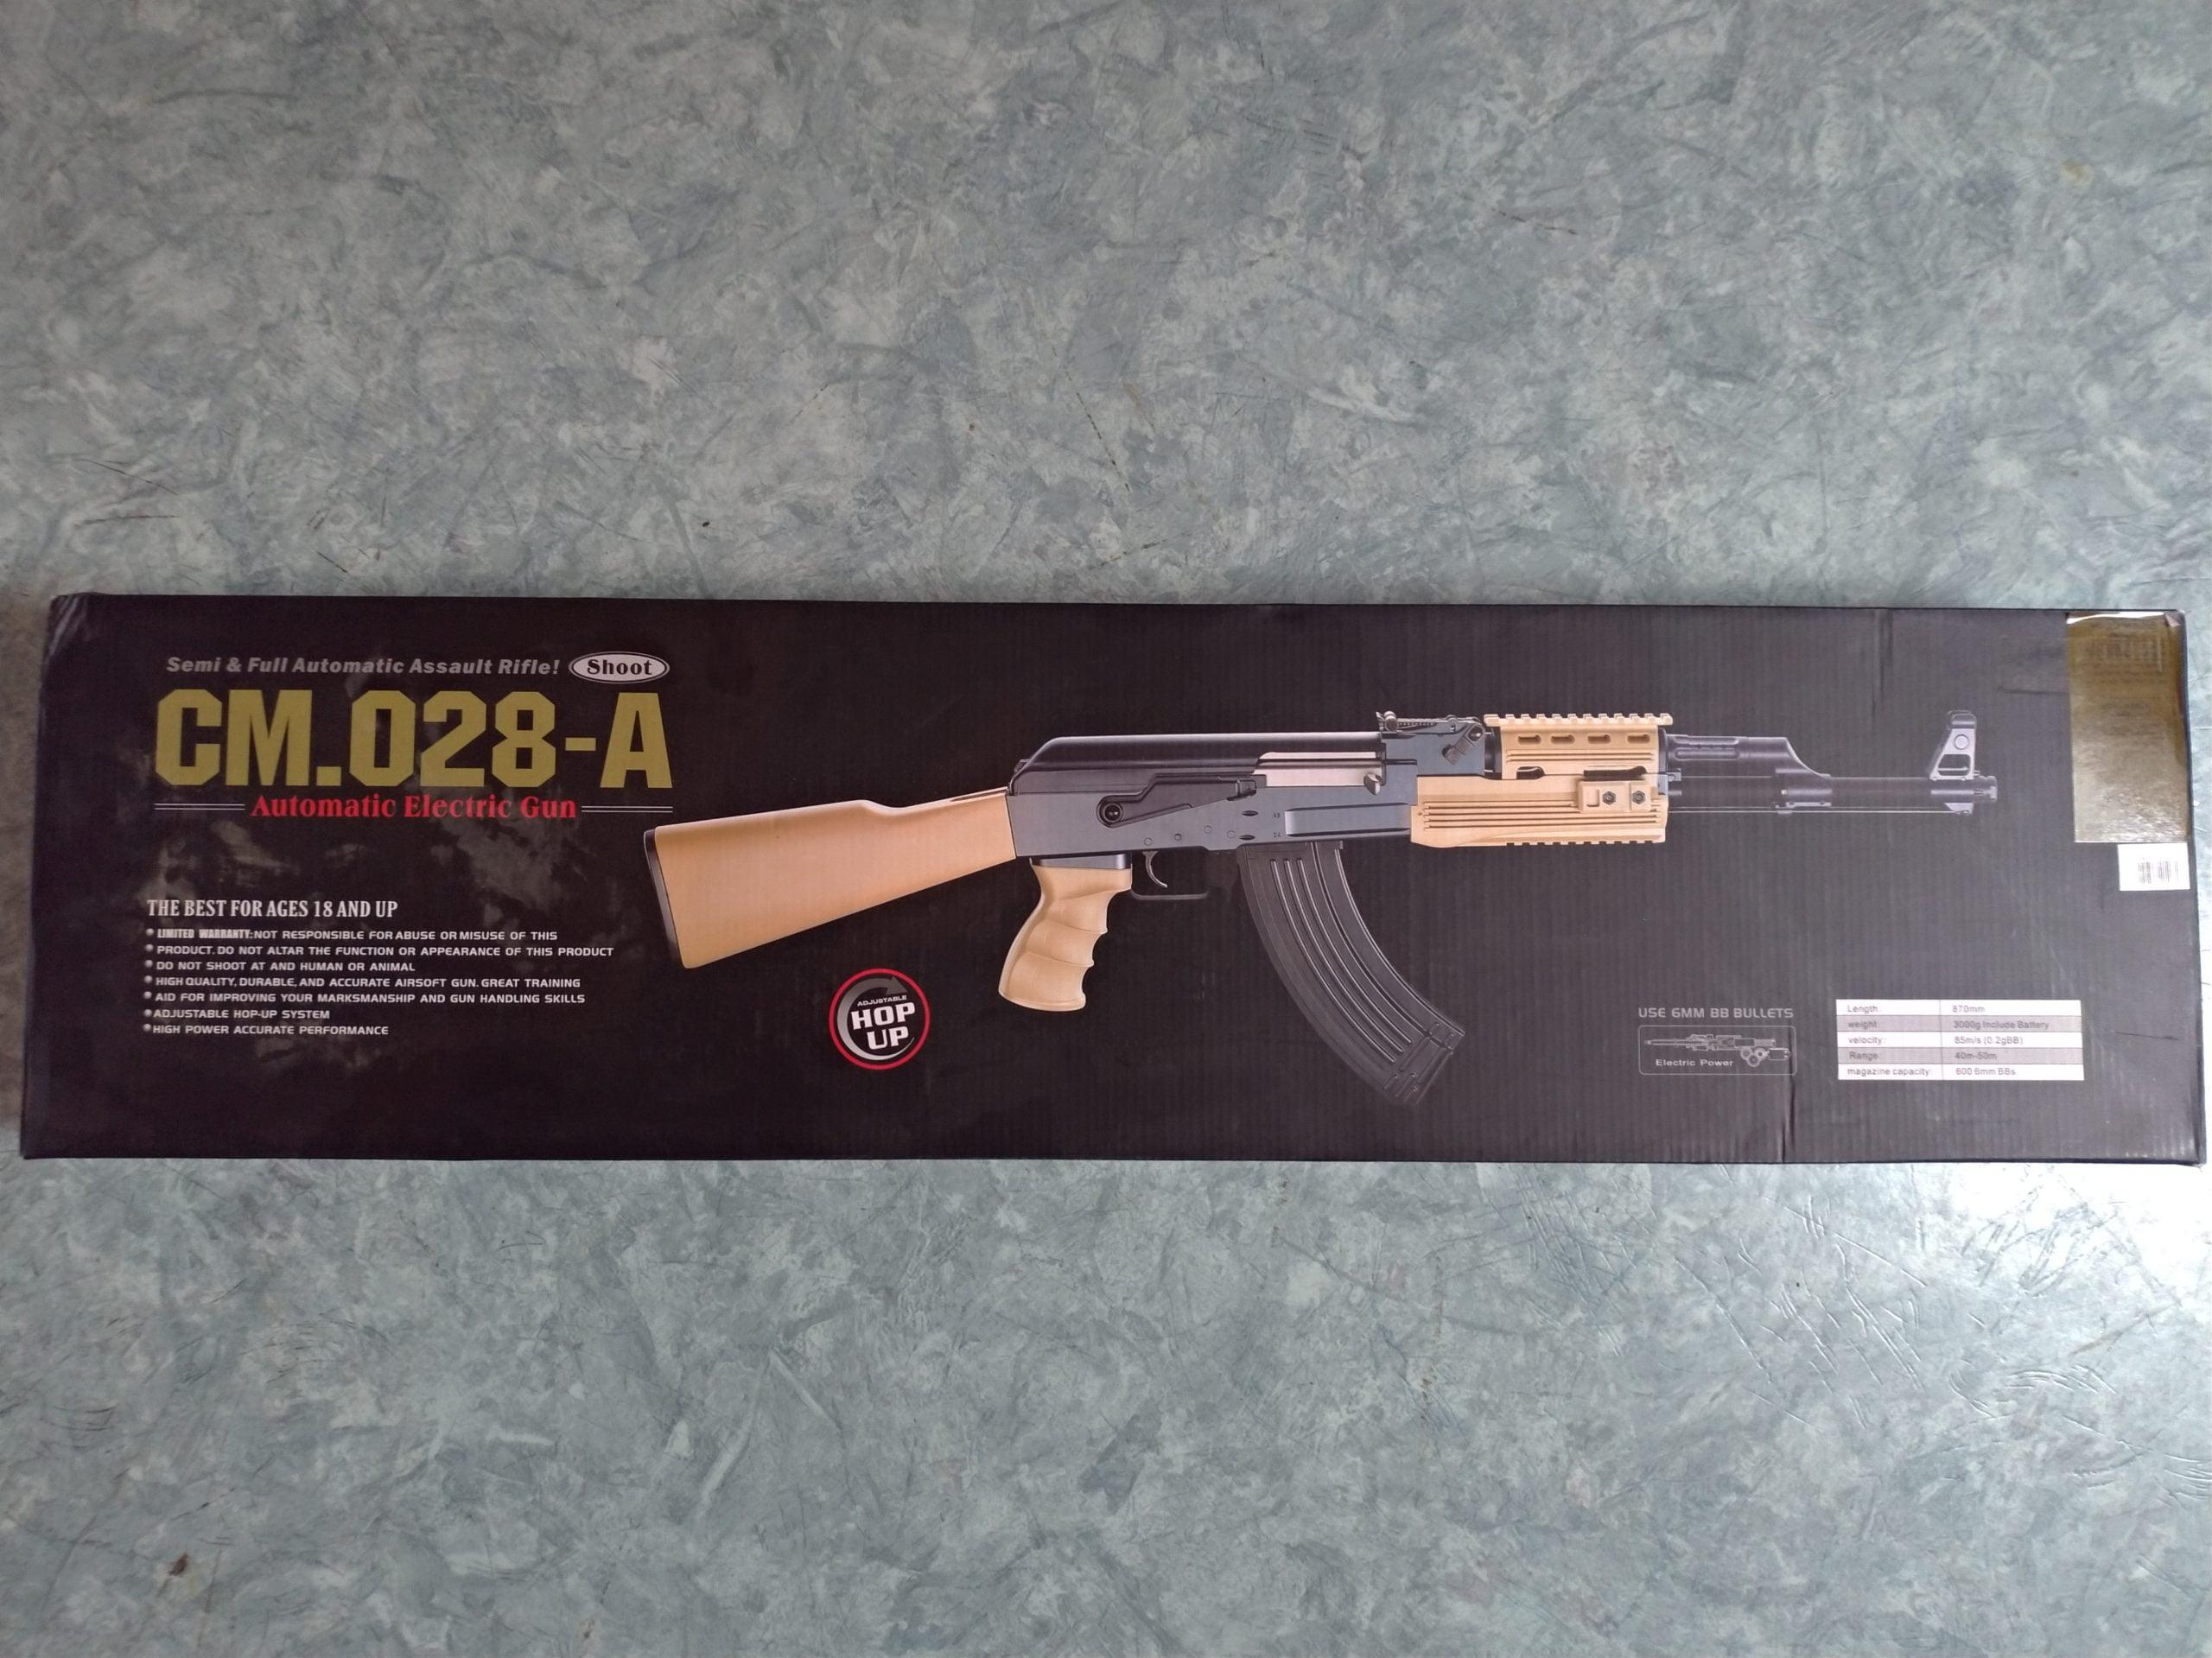 Replique Ak-47 Tactical